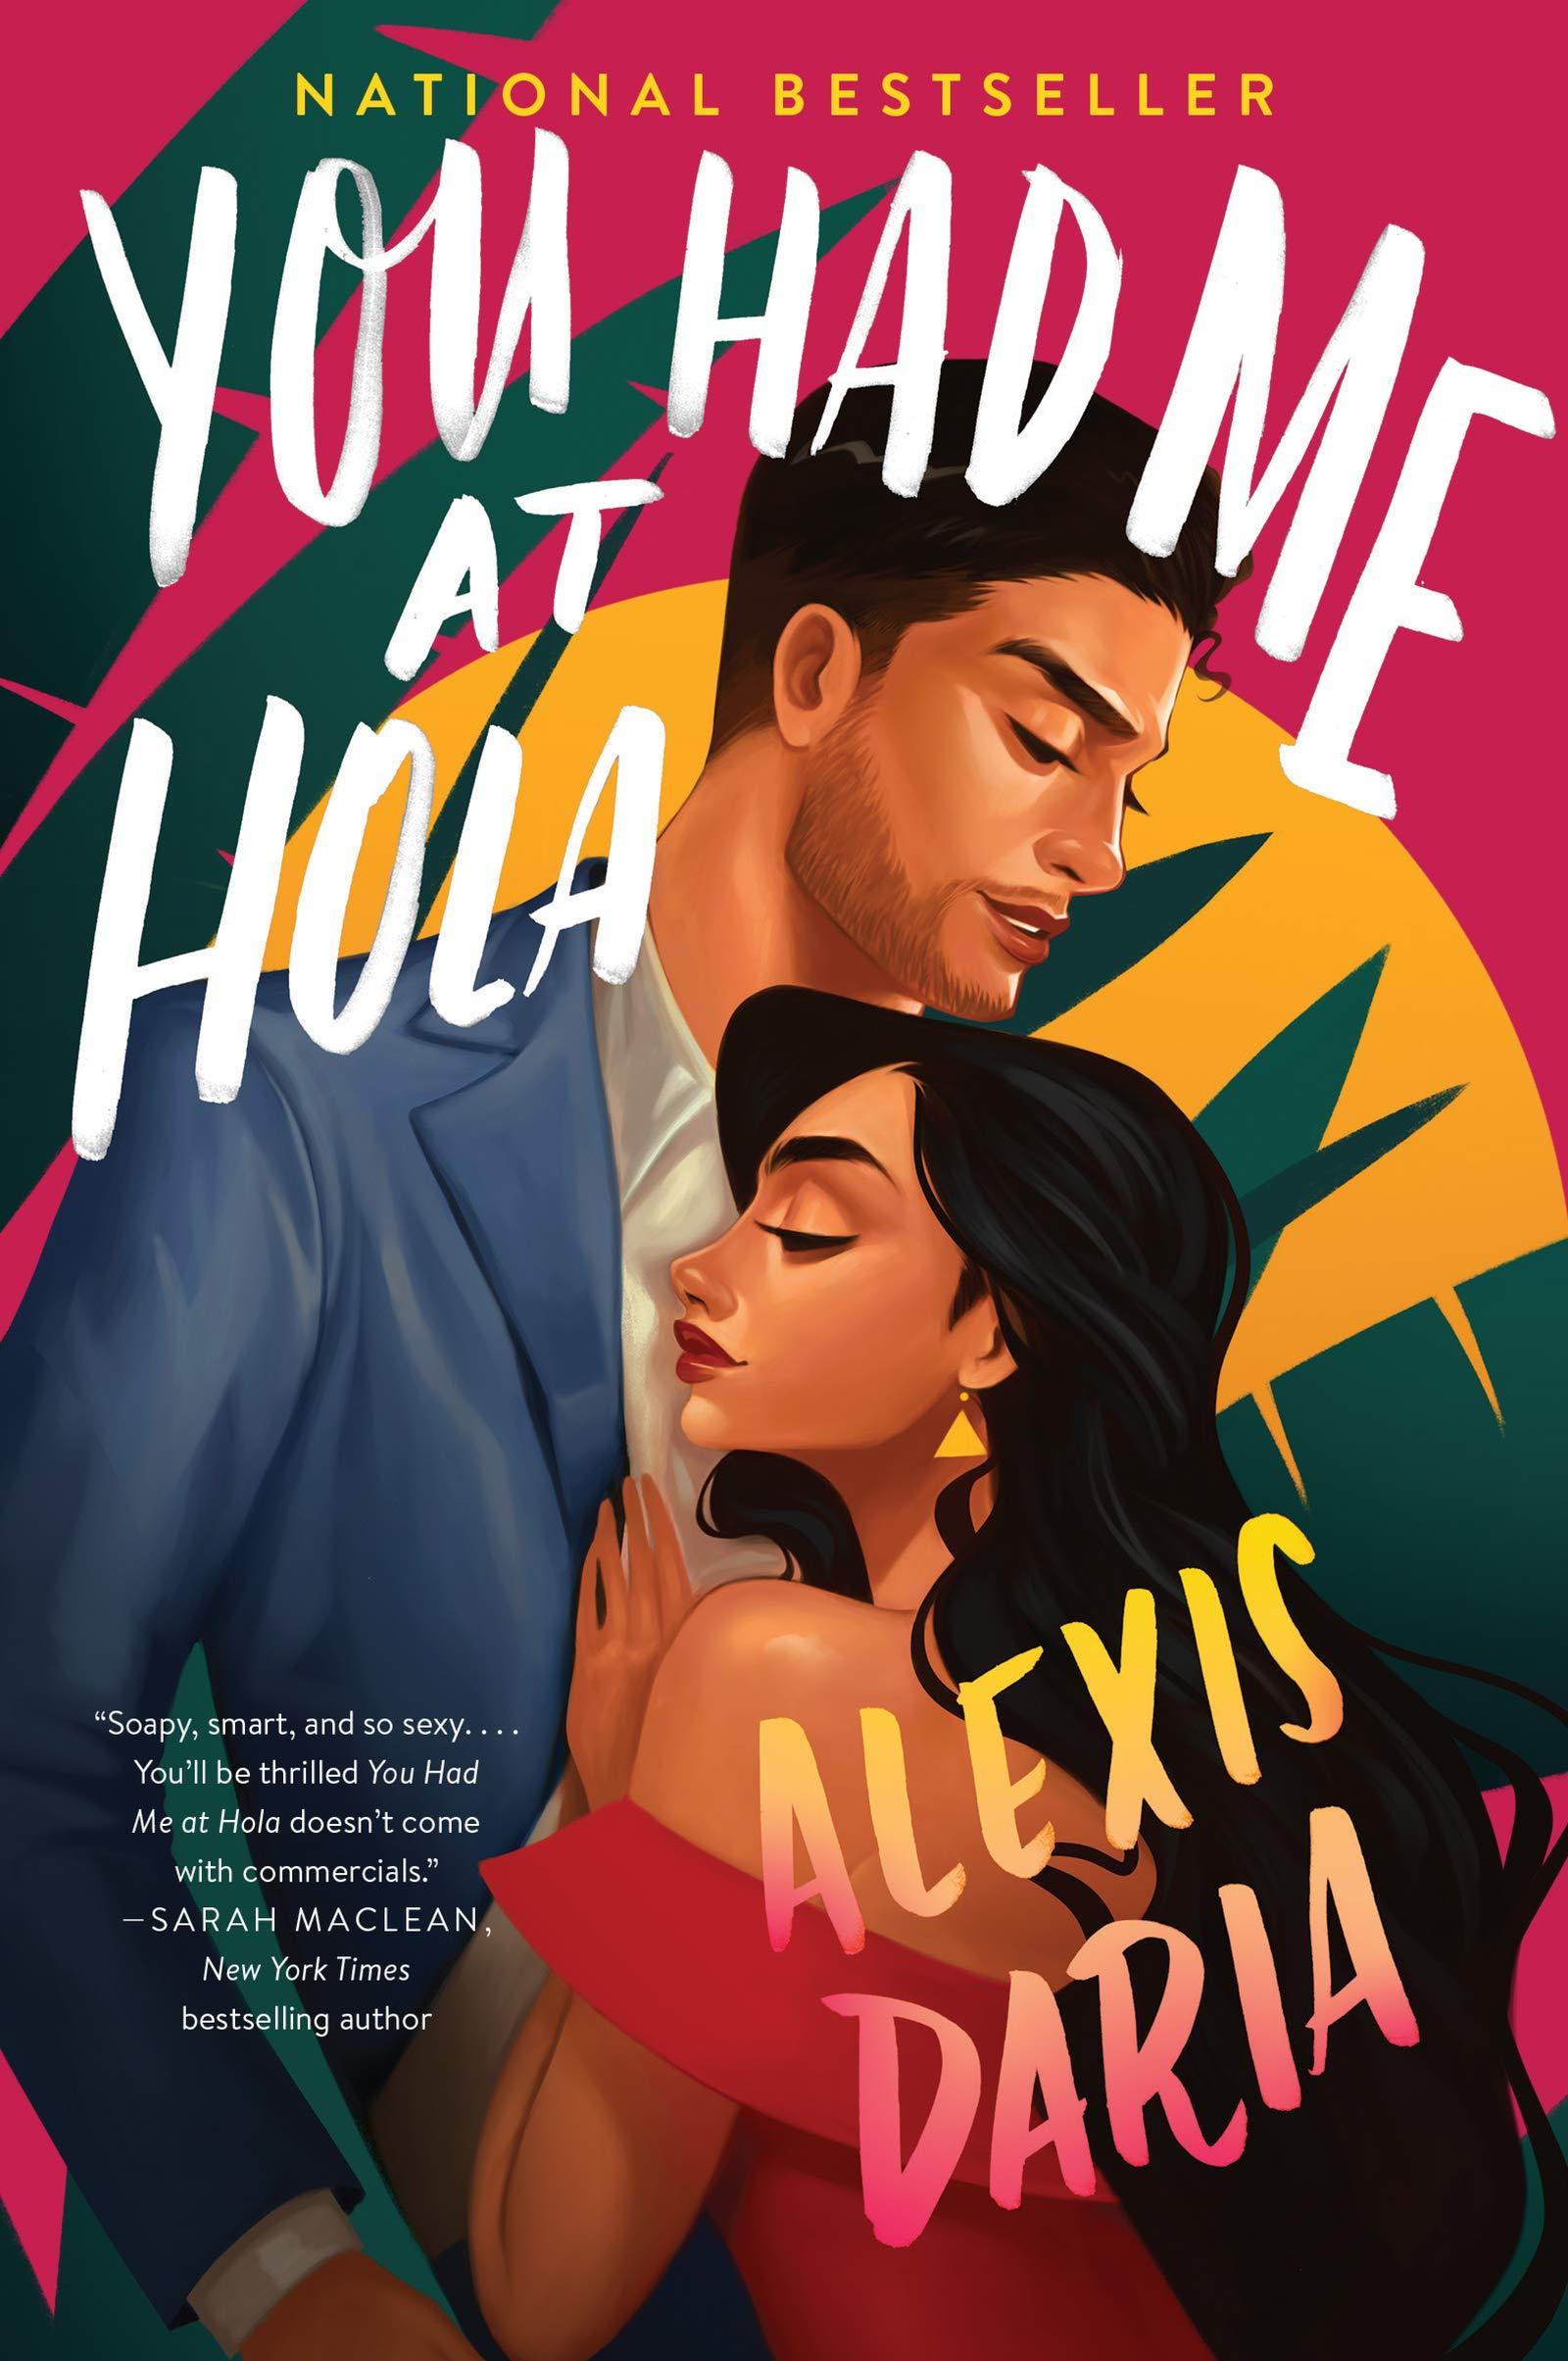 You Had Me at Hola: A Novel: Daria, Alexis: 9780062959928: Amazon.com: Books